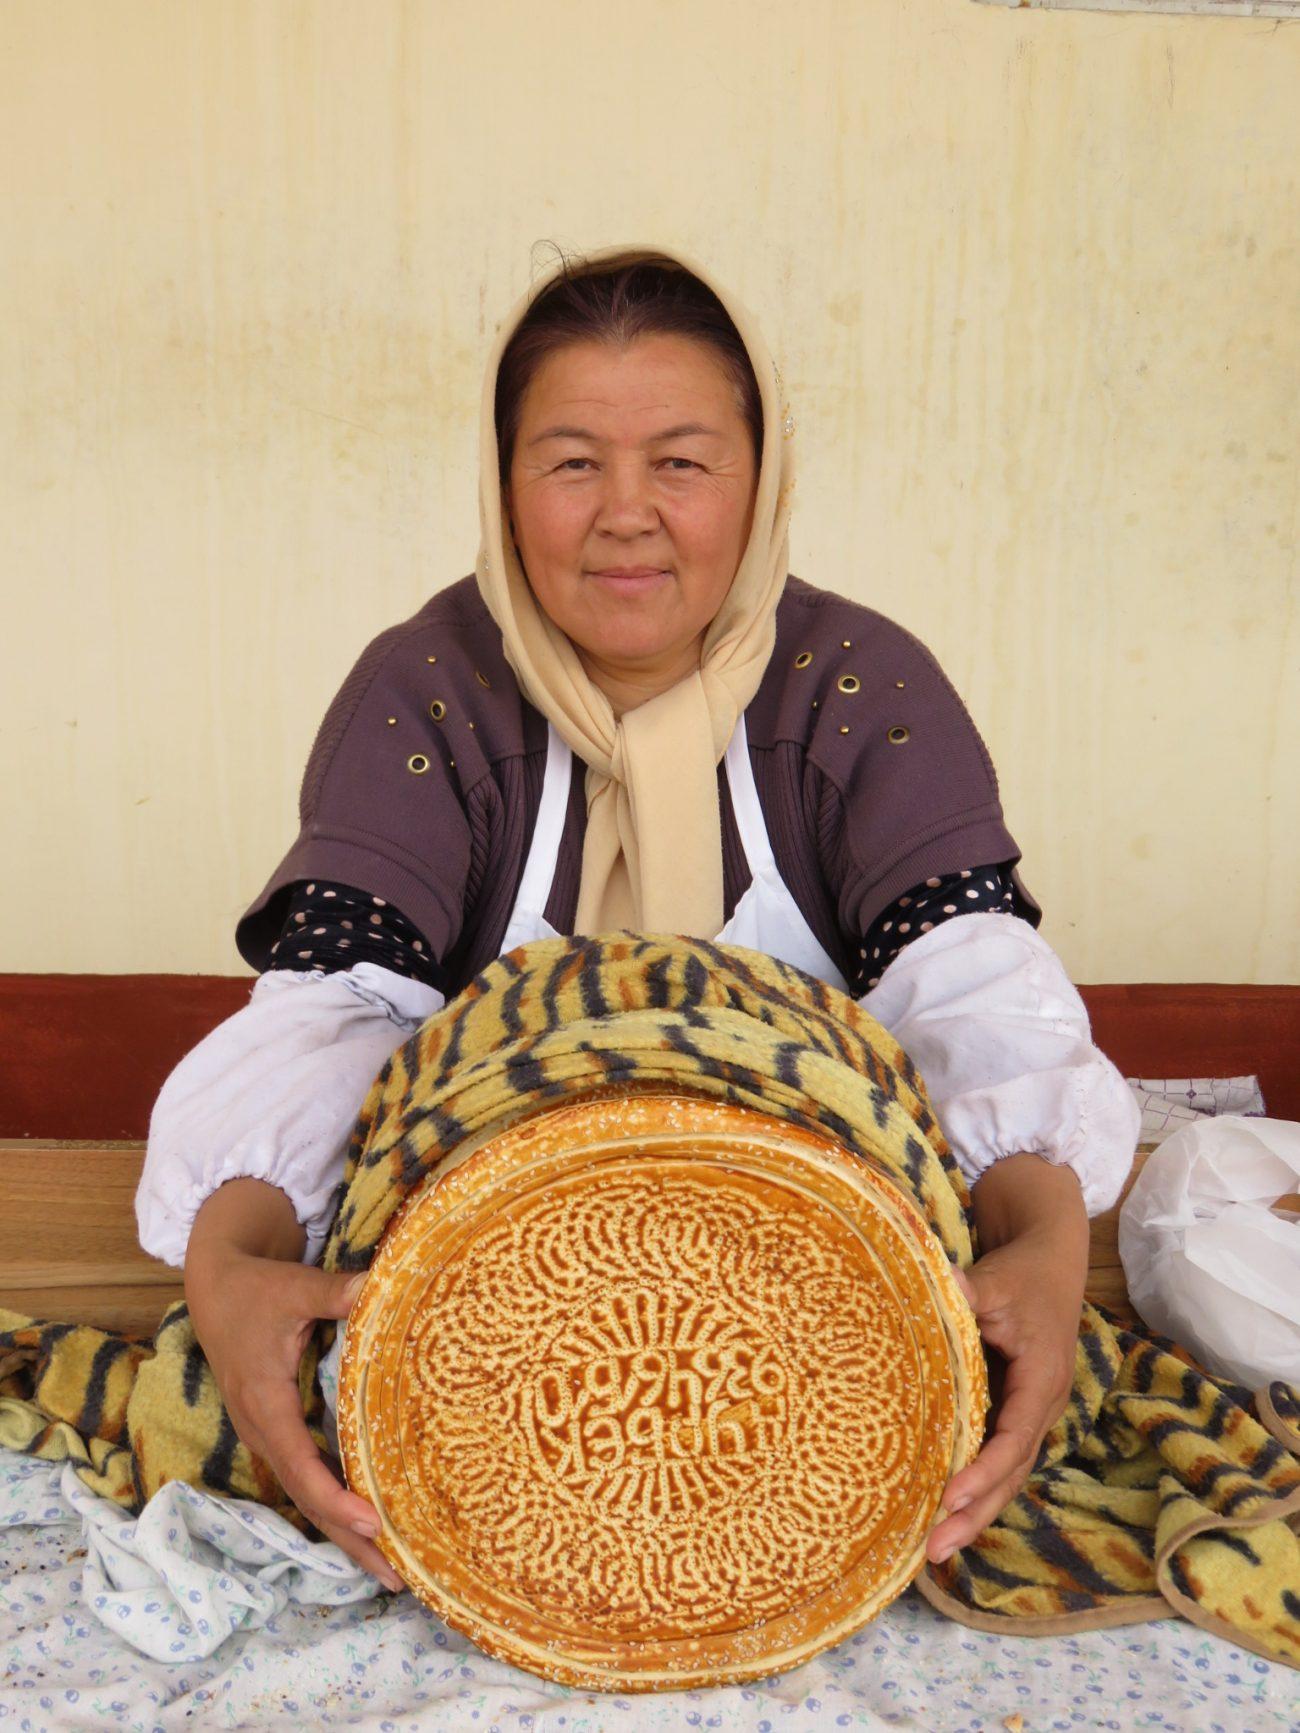 Brot Kokand Usbekistan Bild des Tages